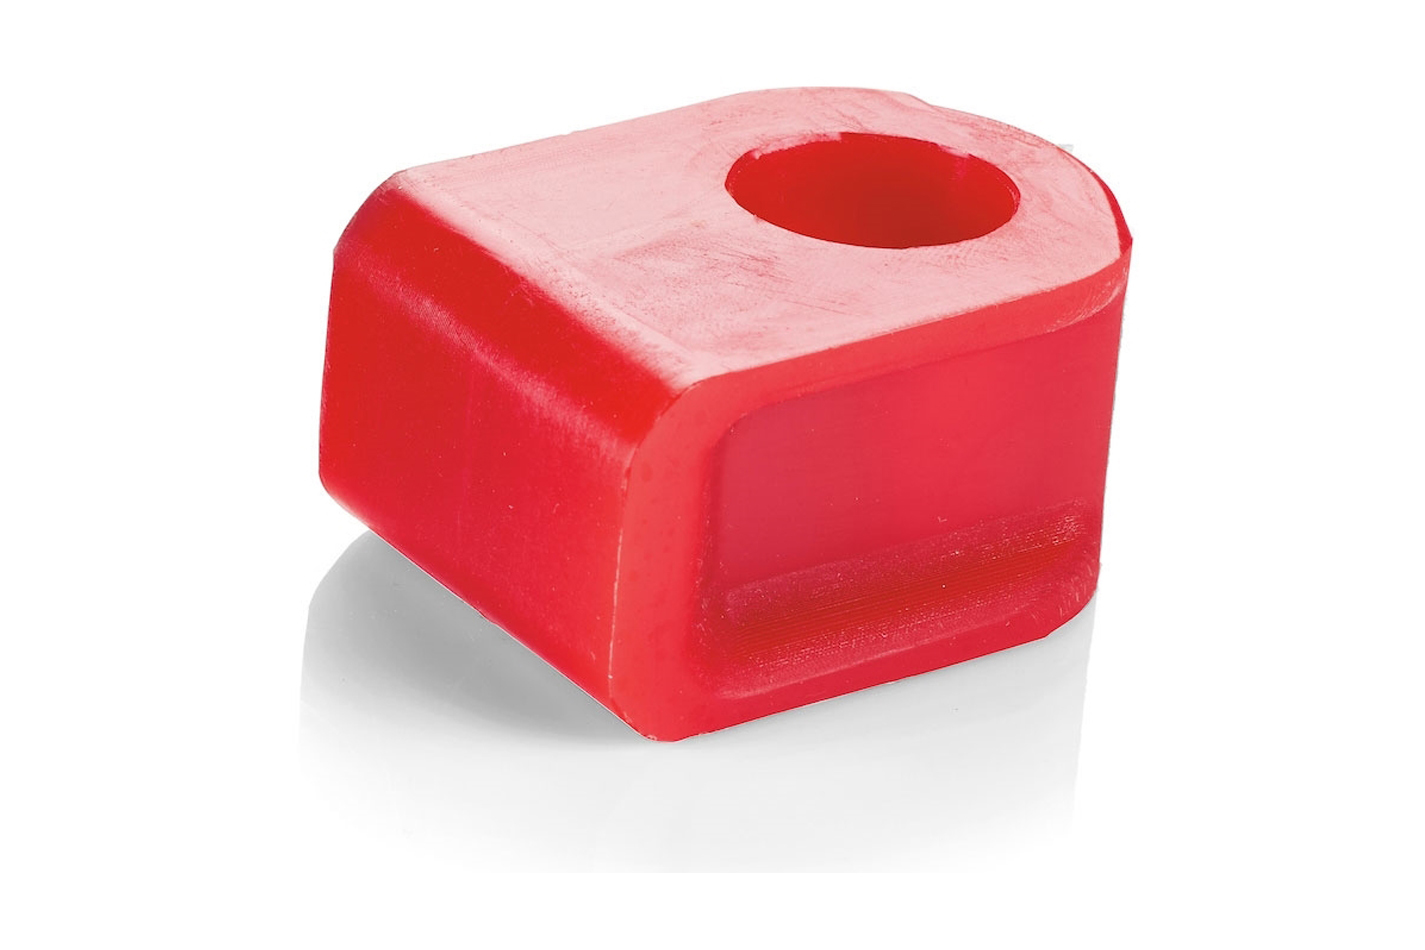 Warn Isolator For Sidewinder Red Each